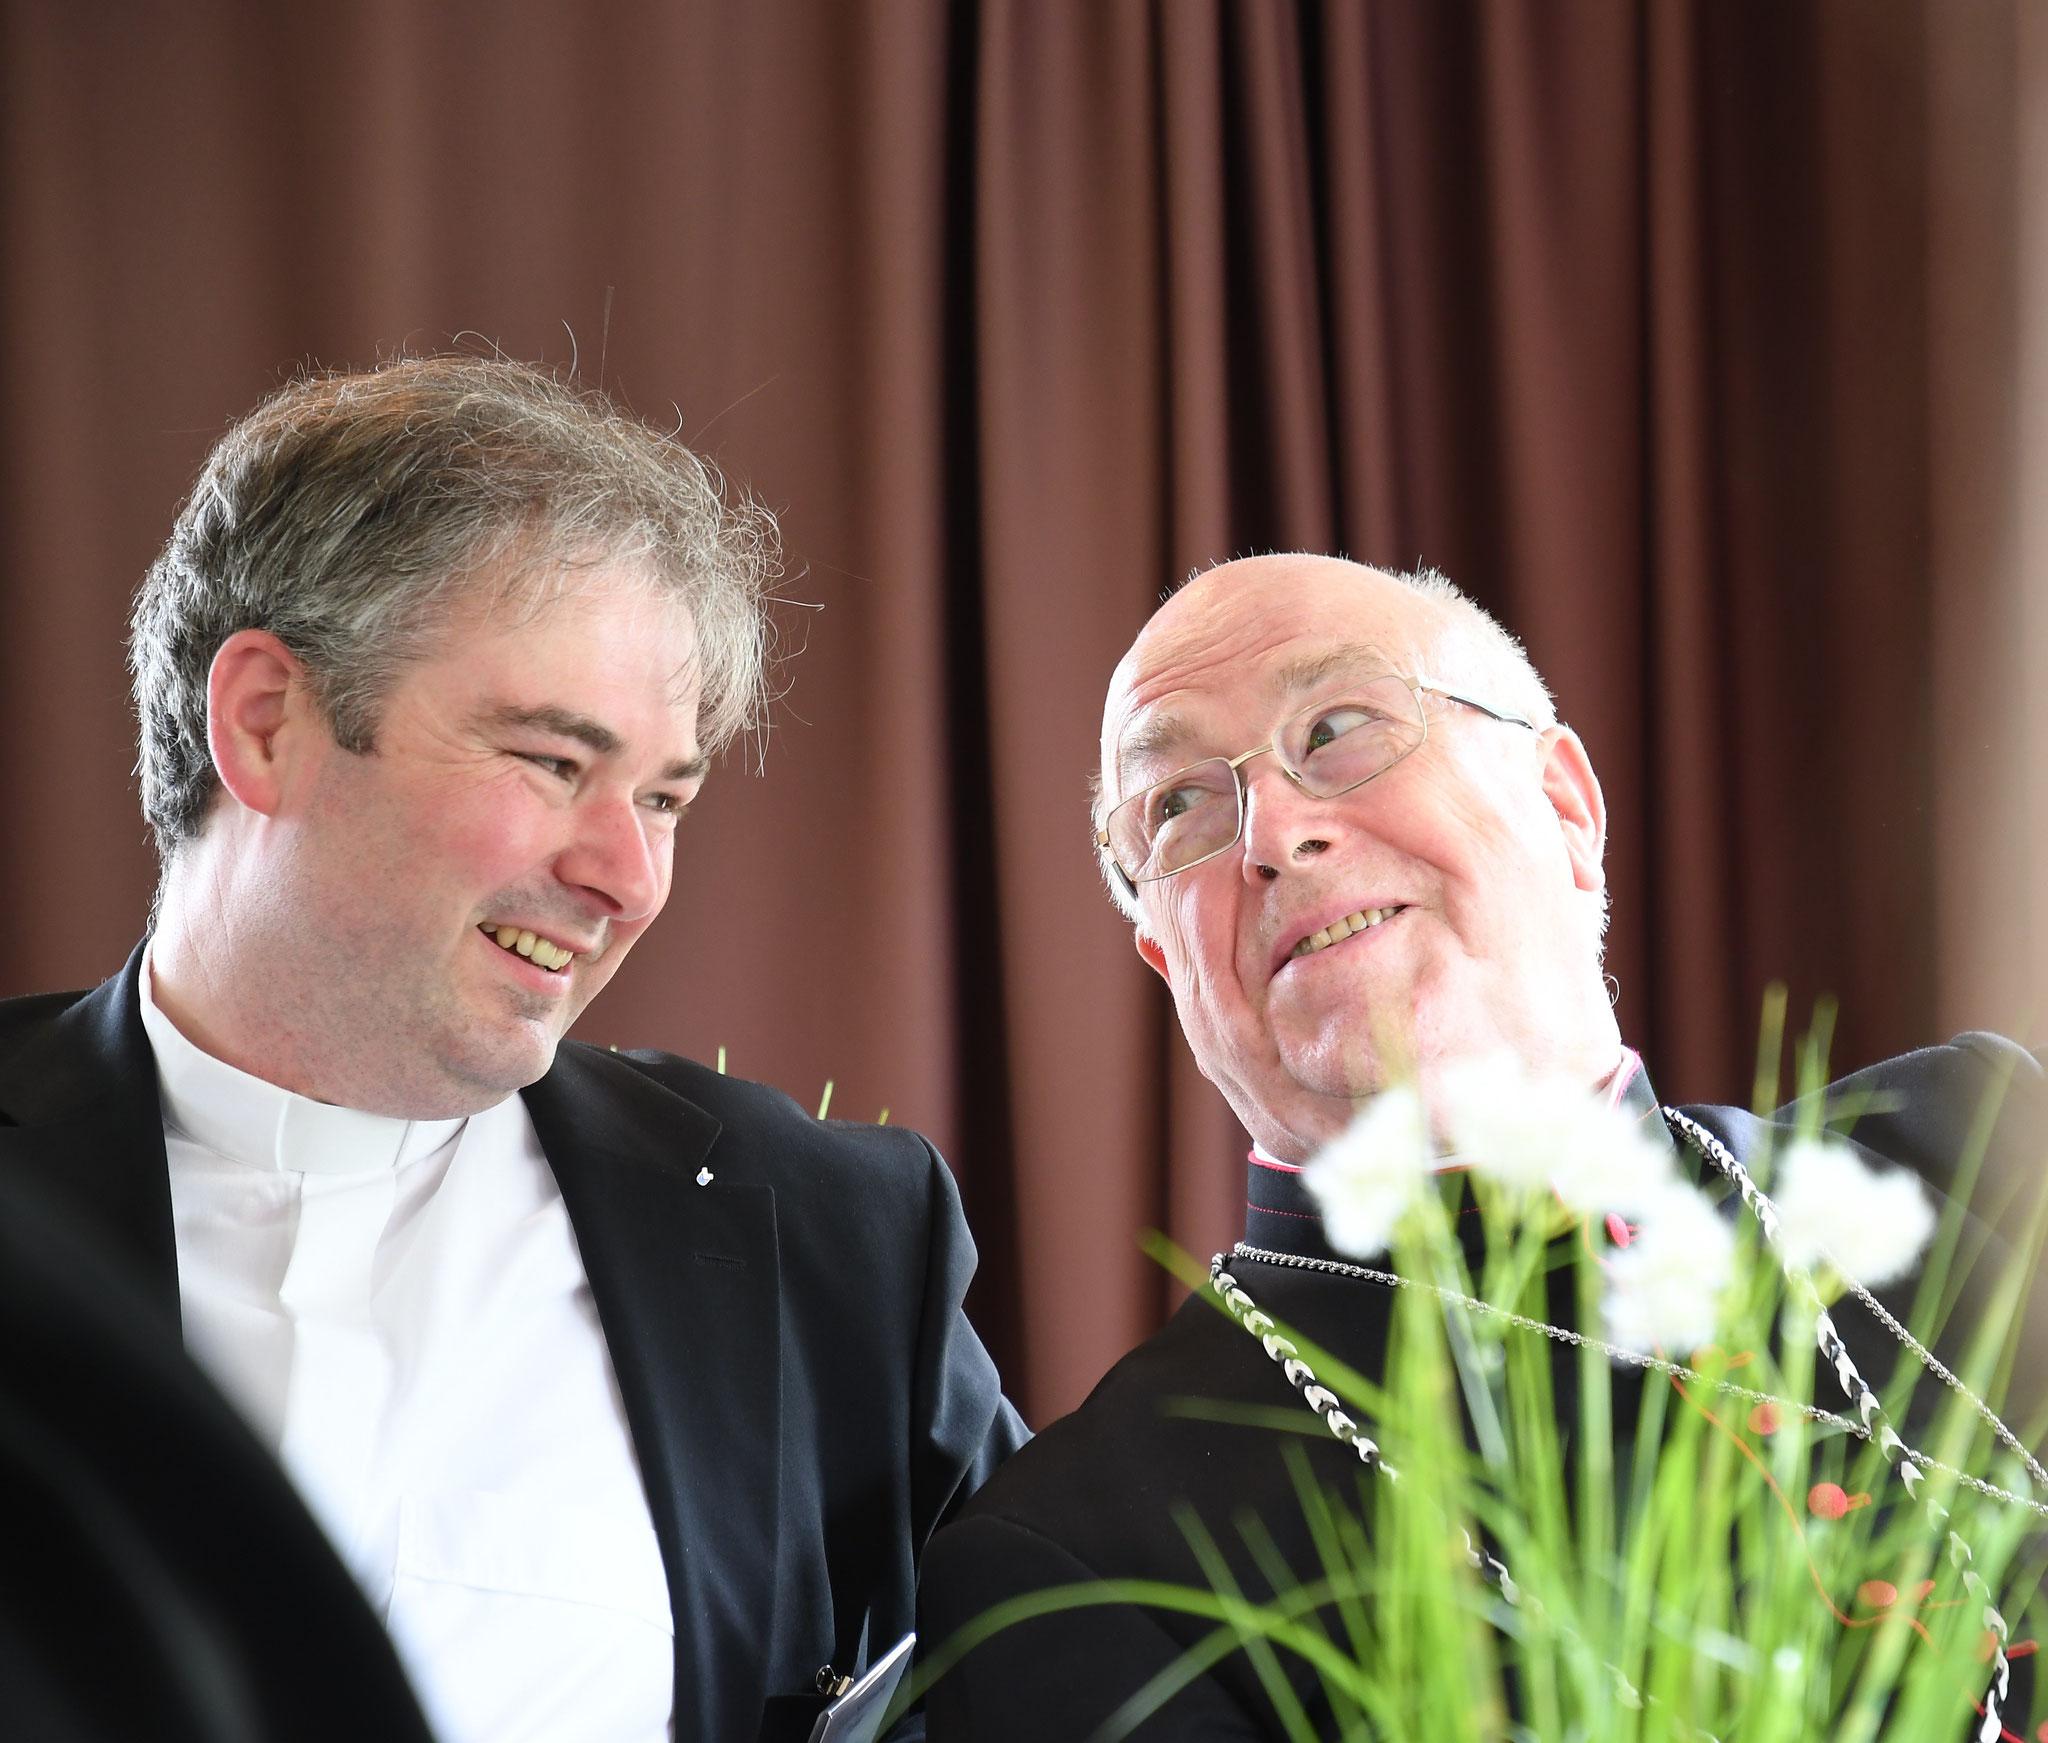 Pastor Tobias Spittmann und S.Em. Erzbischof Hans-Josef Becker. Foto: Maria Hopp